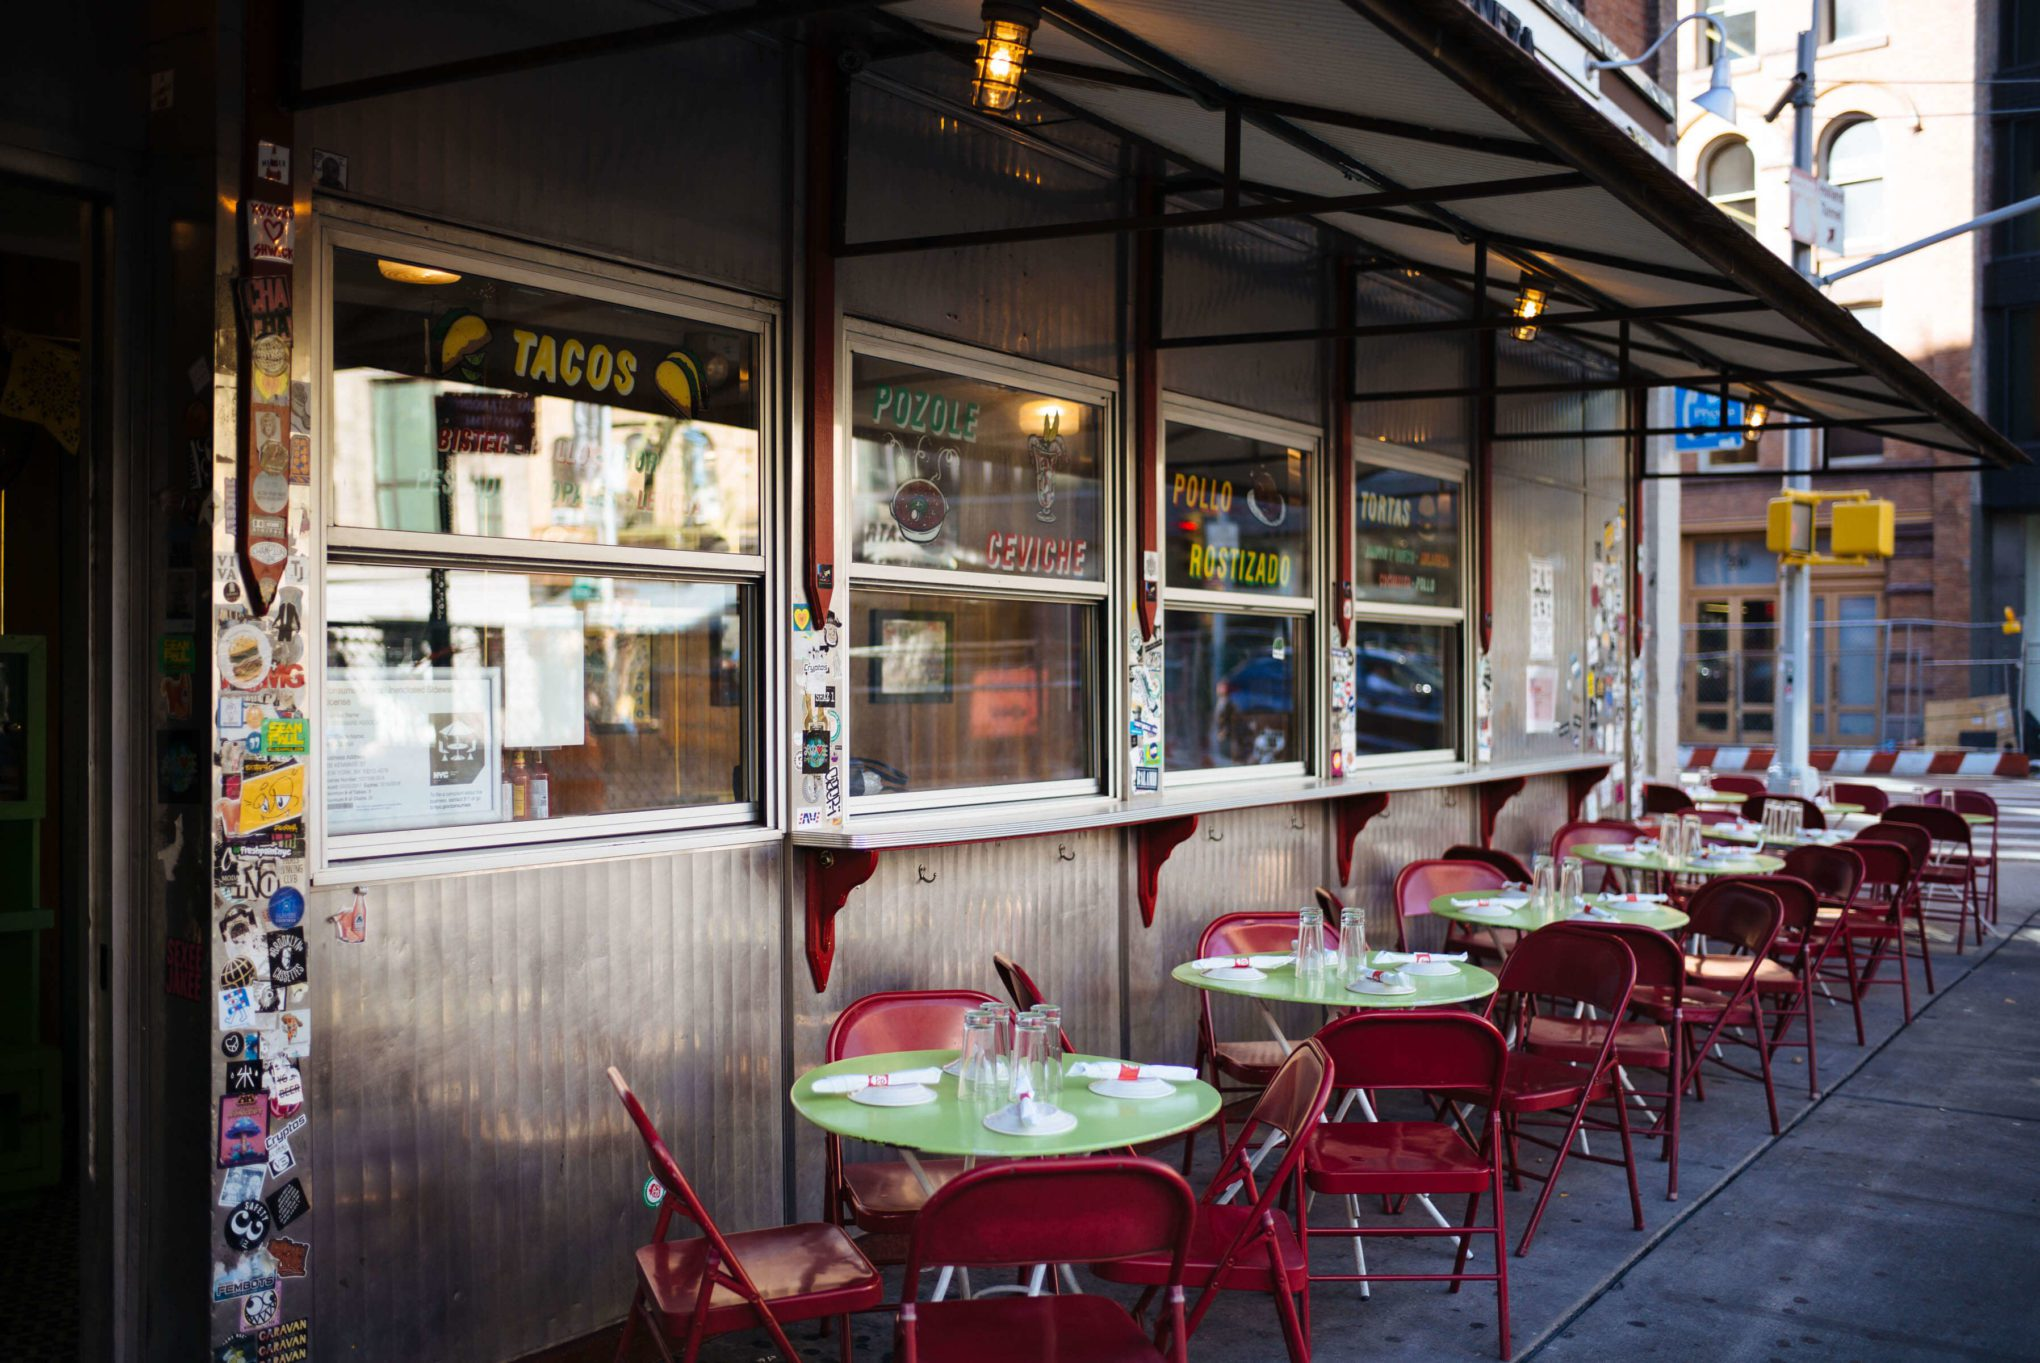 Restaurant Guide for a 24 hour travel guide New York City, The Taste SF